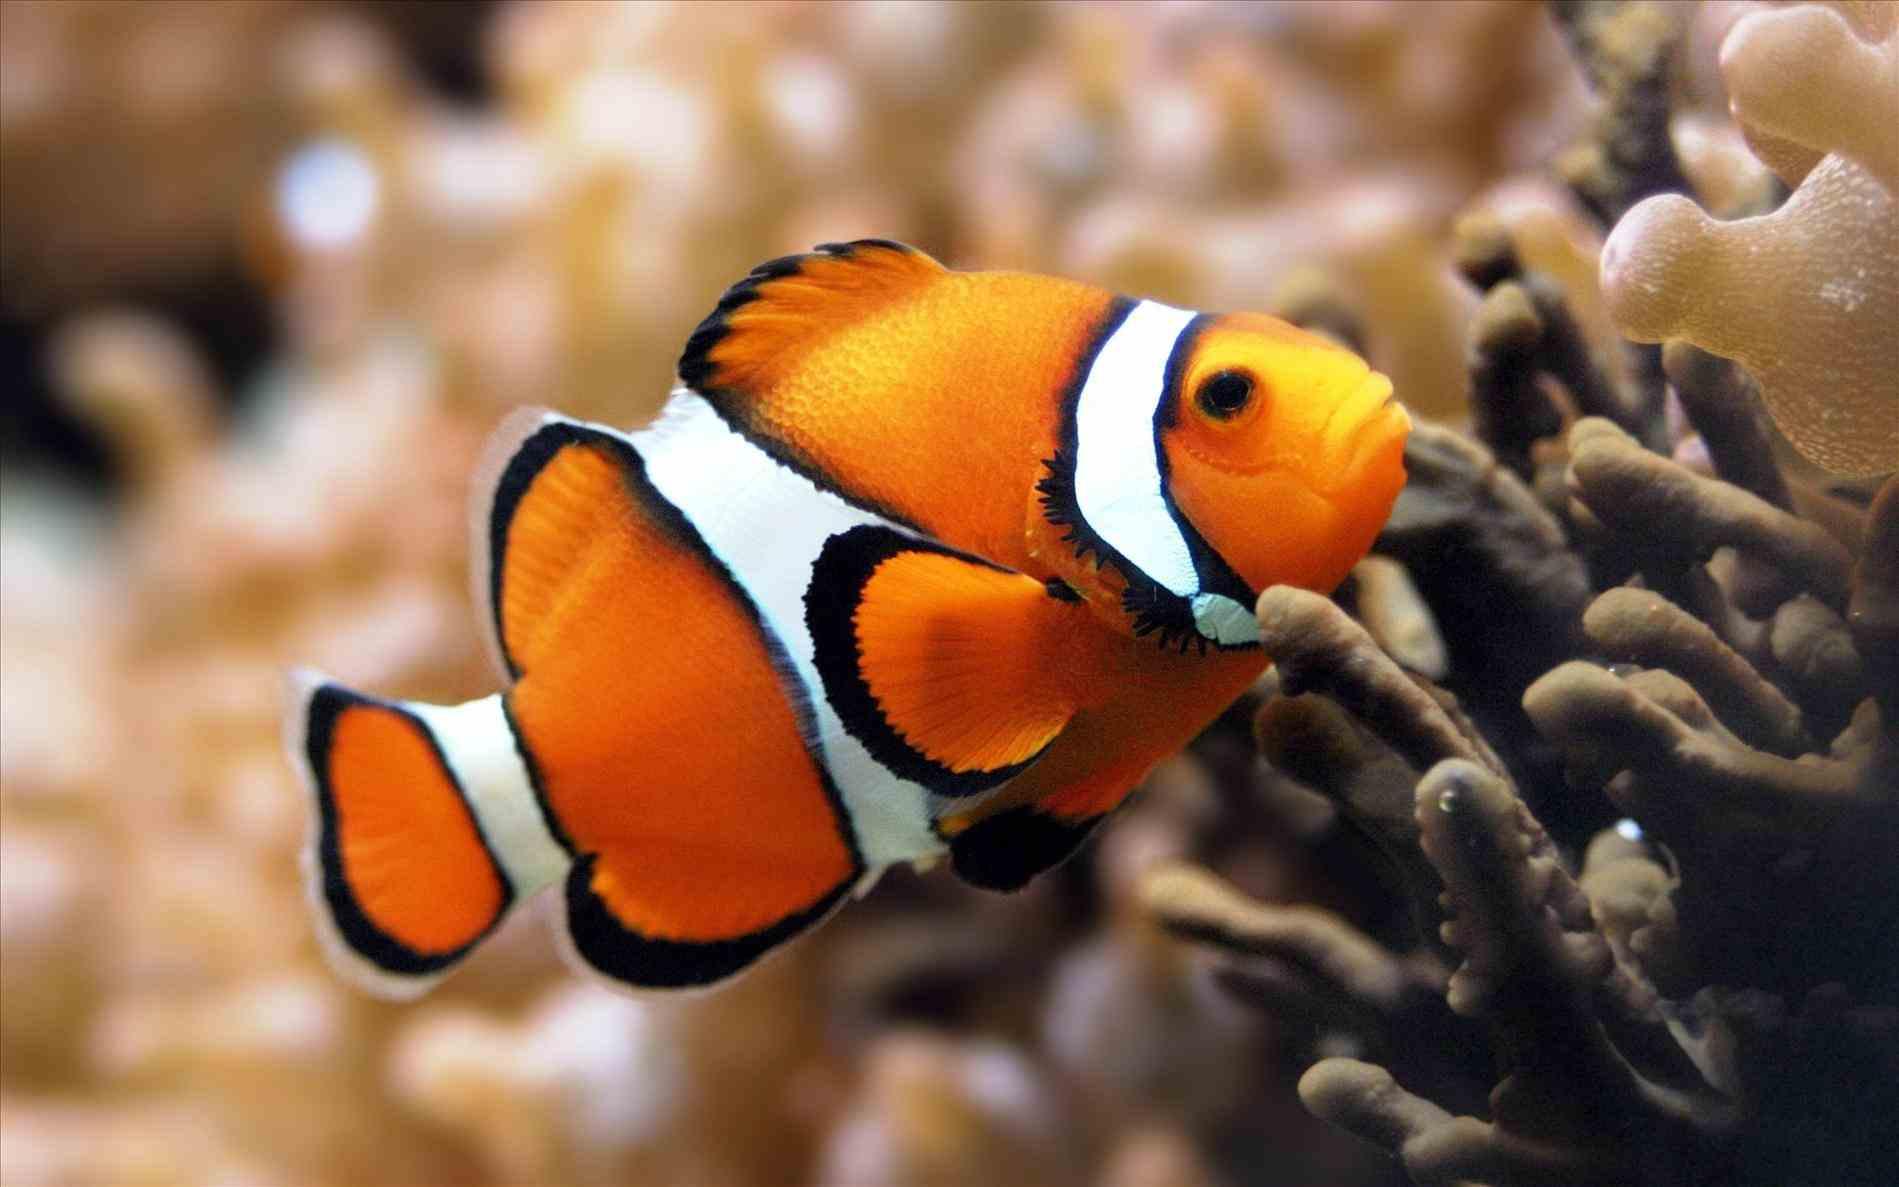 Ocean clipart orange color Ocean Number out Fish cut